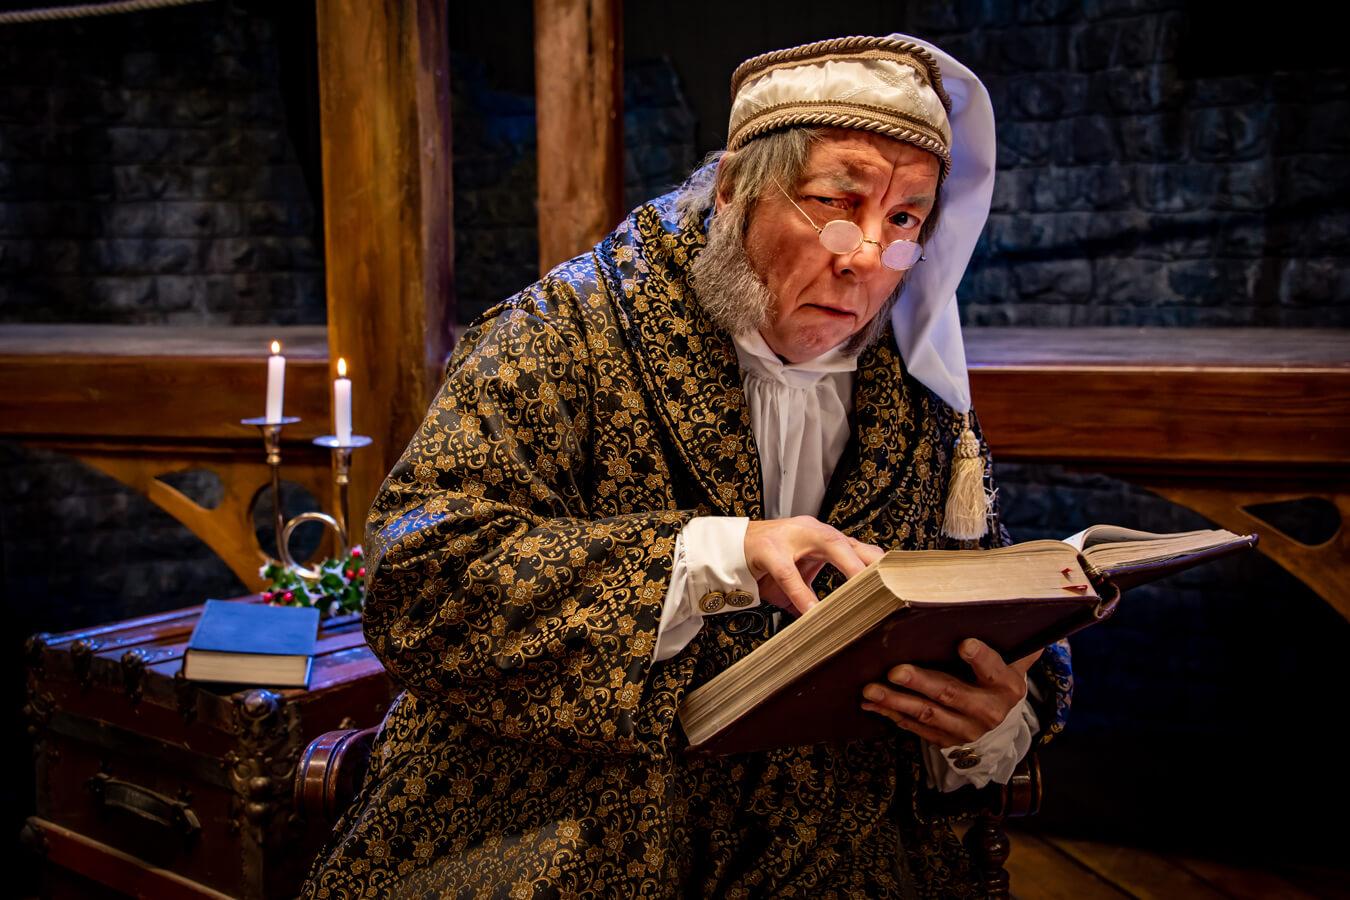 Ebenezer Scrooge in A Christmas Carol